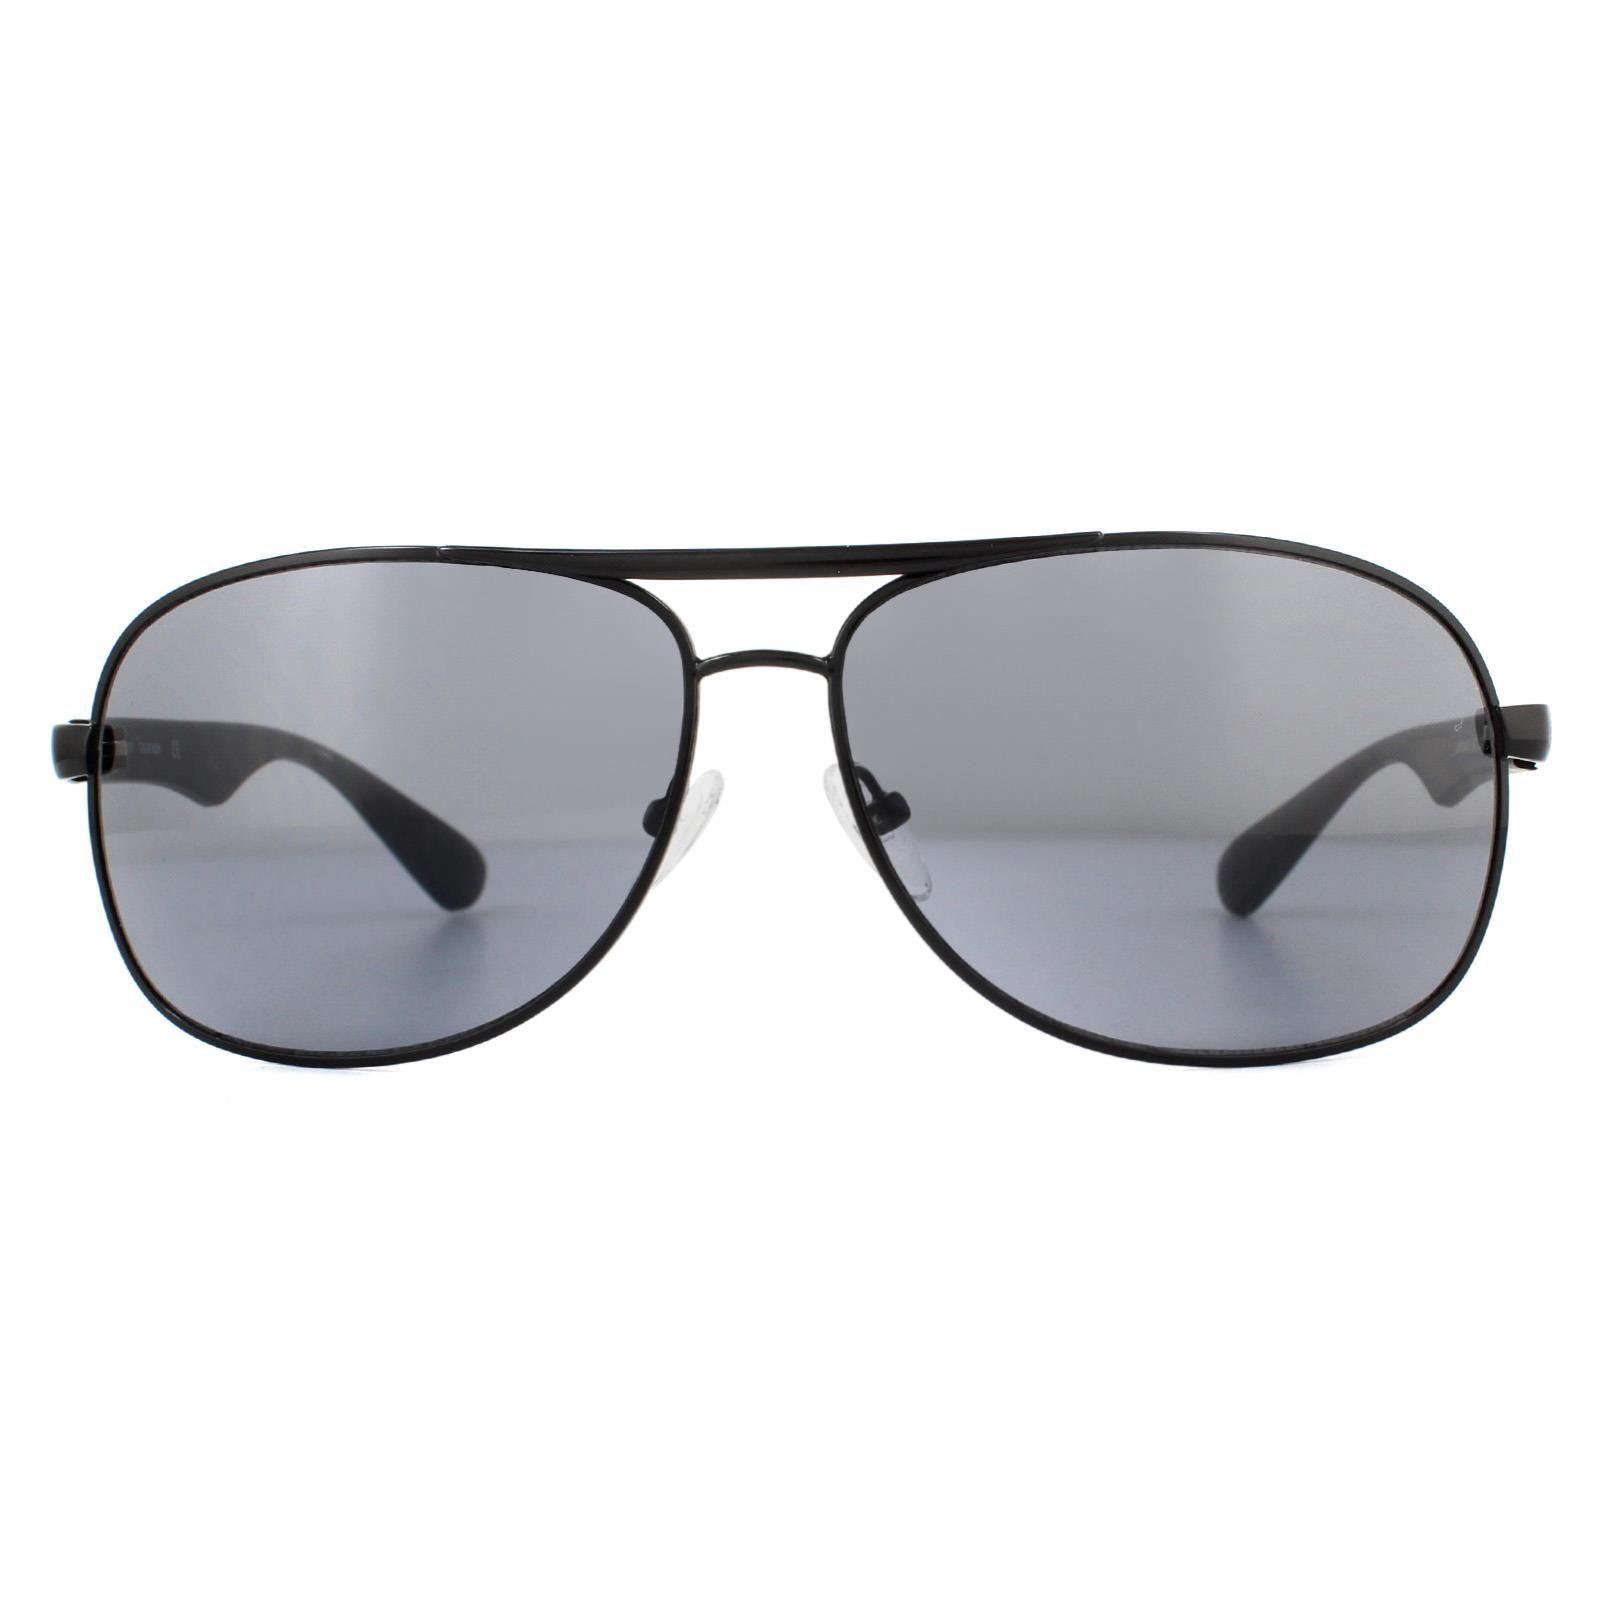 Calvin Klein Sunglasses CK19315S 001 Black Grey